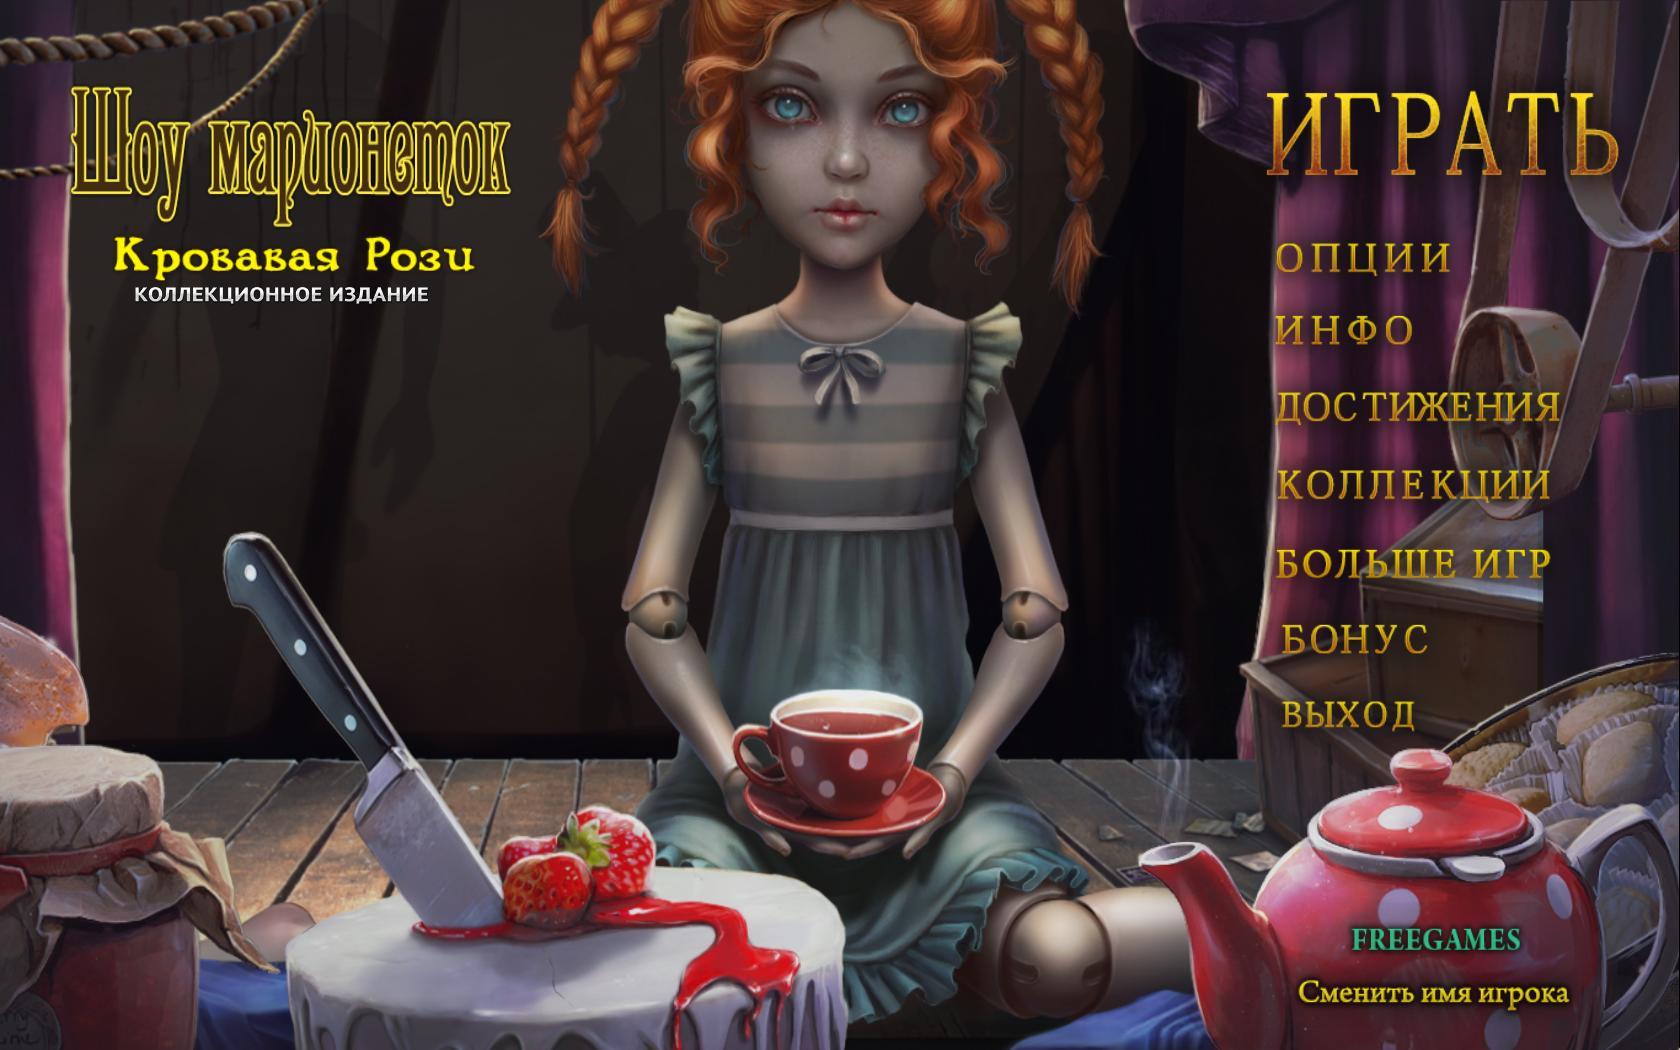 Шоу марионеток 10: Кровавая Рози. Коллекционное издание | PuppetShow 10: Bloody Rosie CE (Rus)